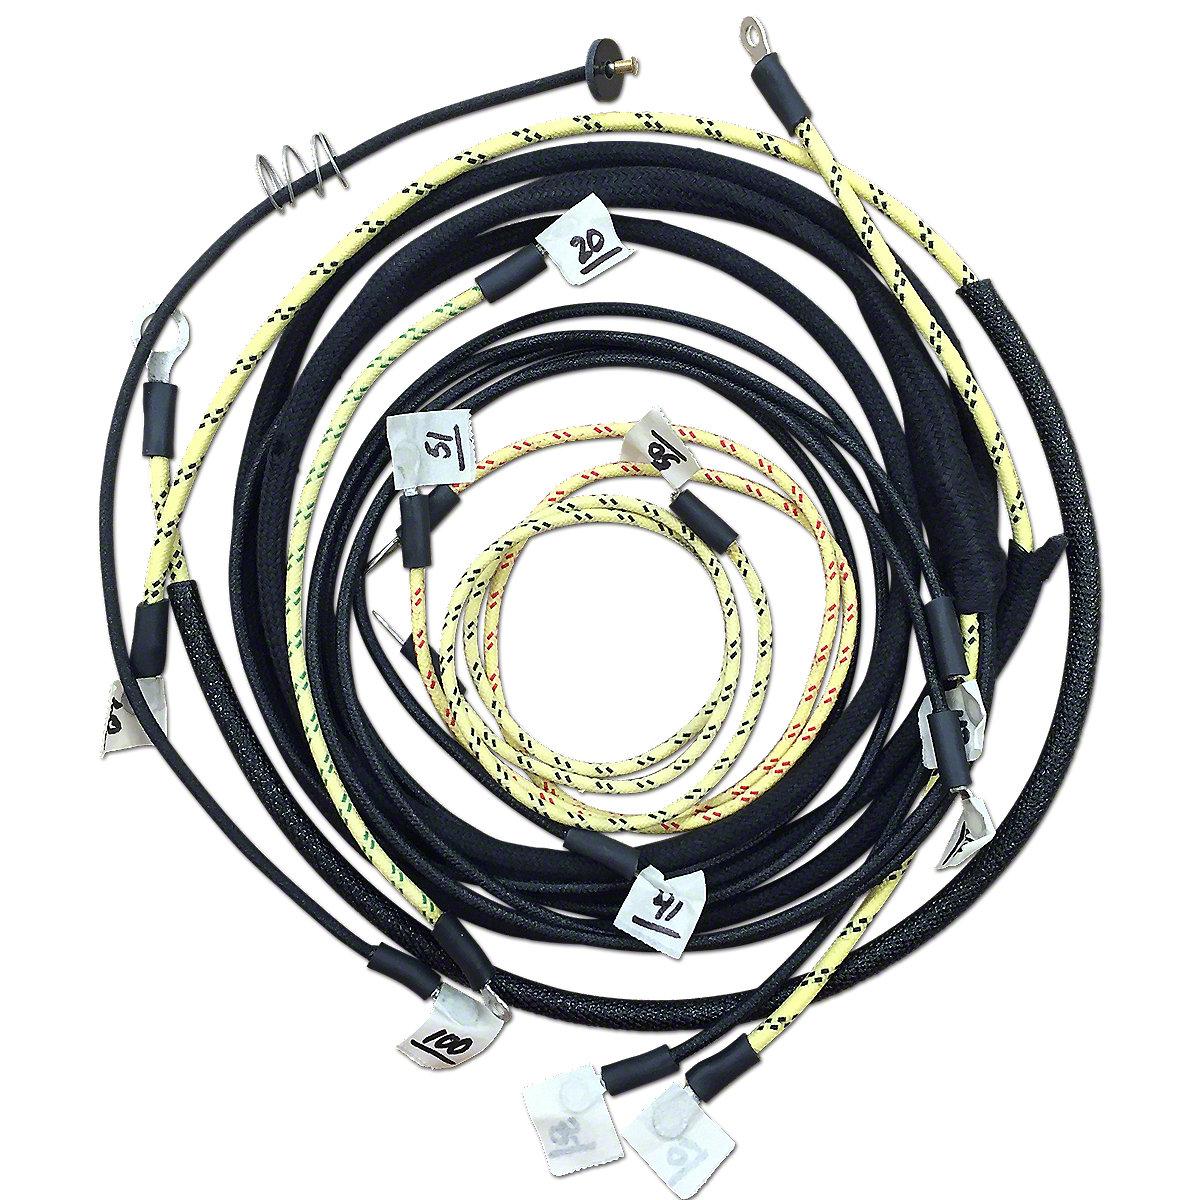 restoration quality wiring harness jds3563